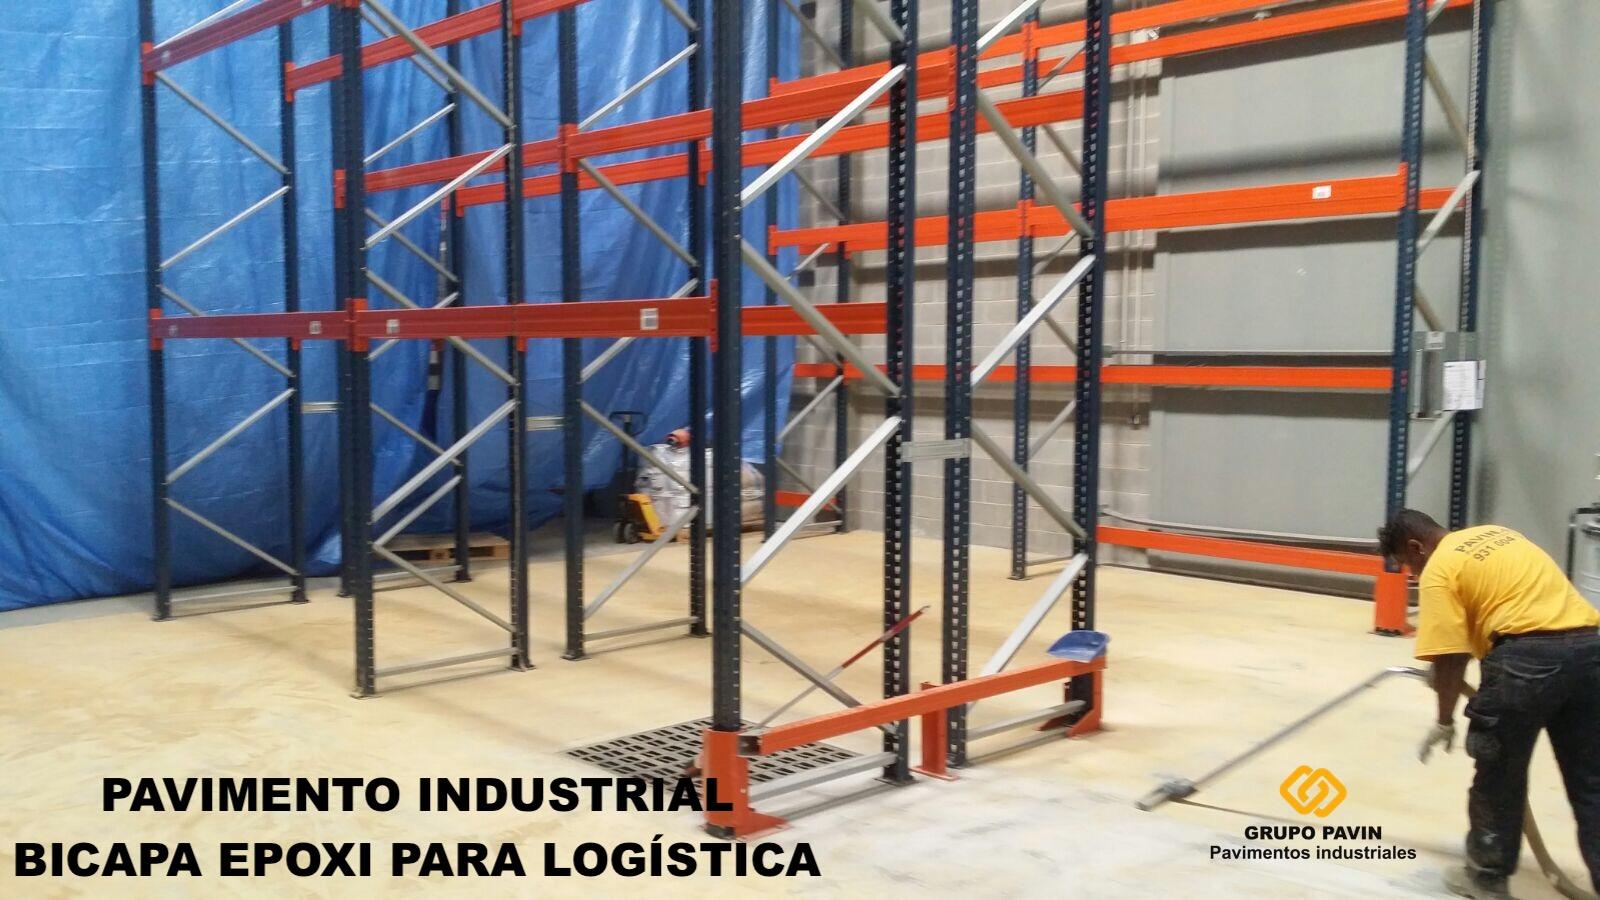 Pavimento industrial bicapa epoxi para empresa logística